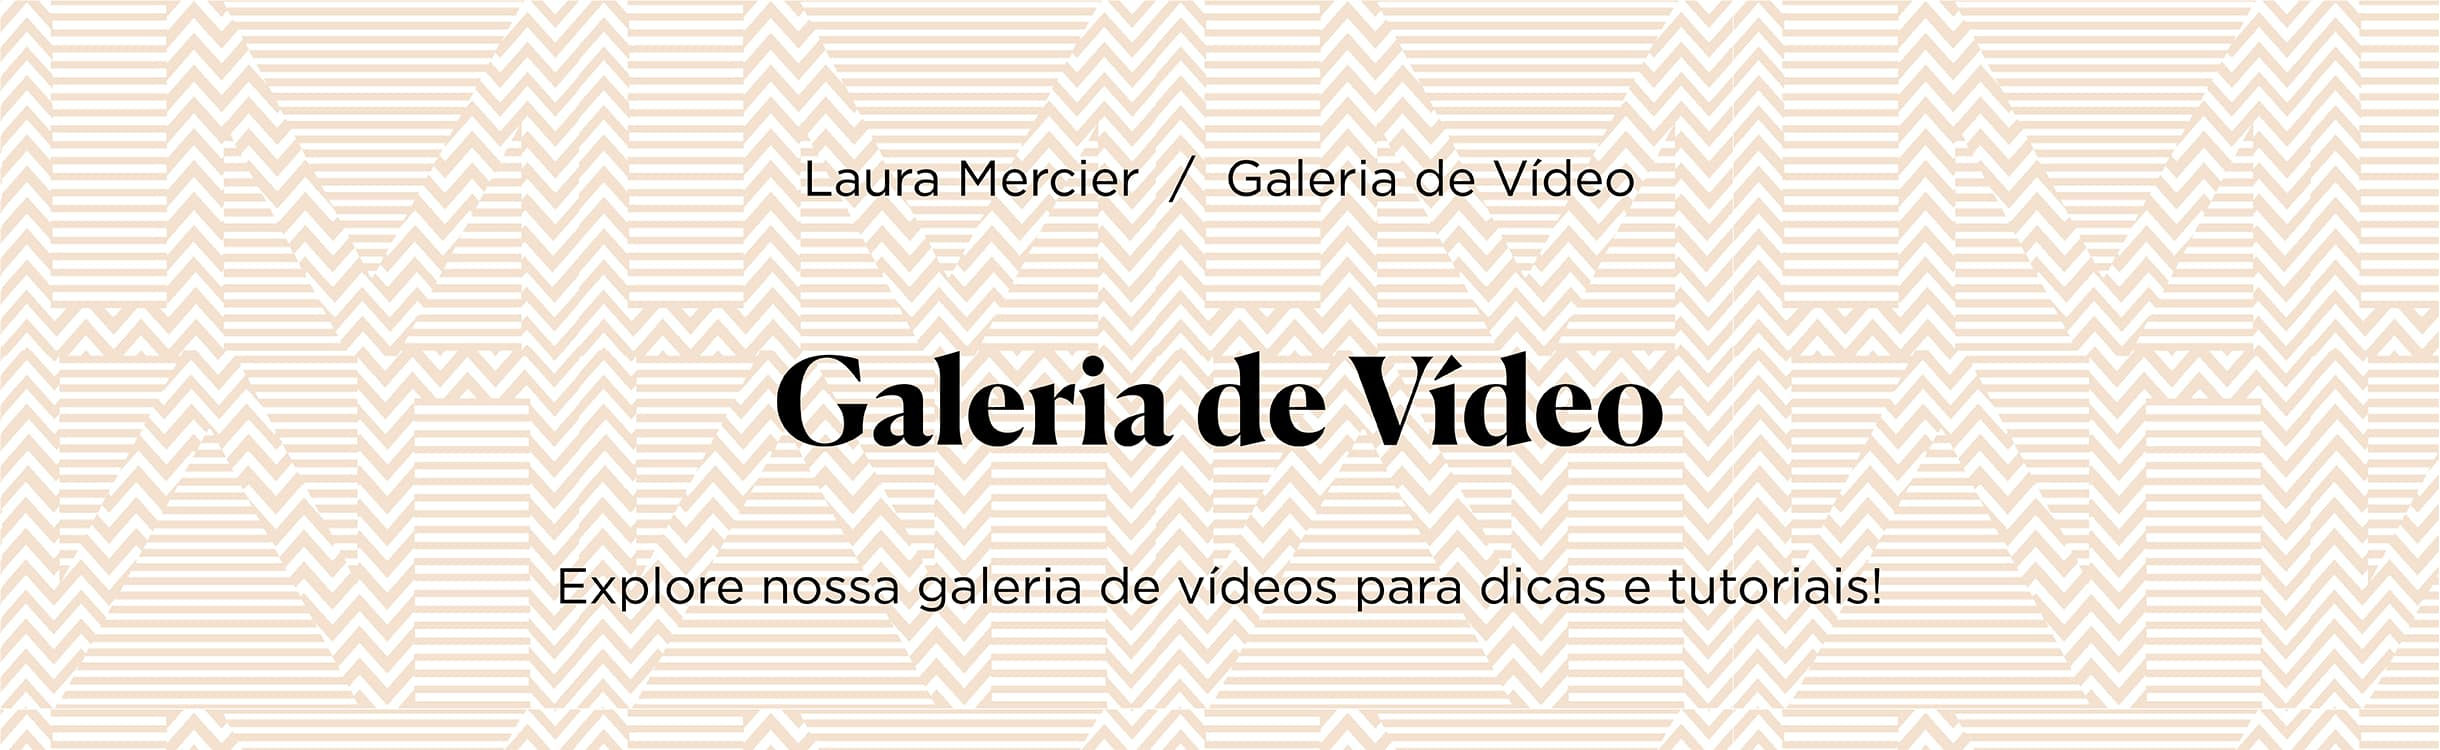 Galeria de Vídeo_Página de Categoria